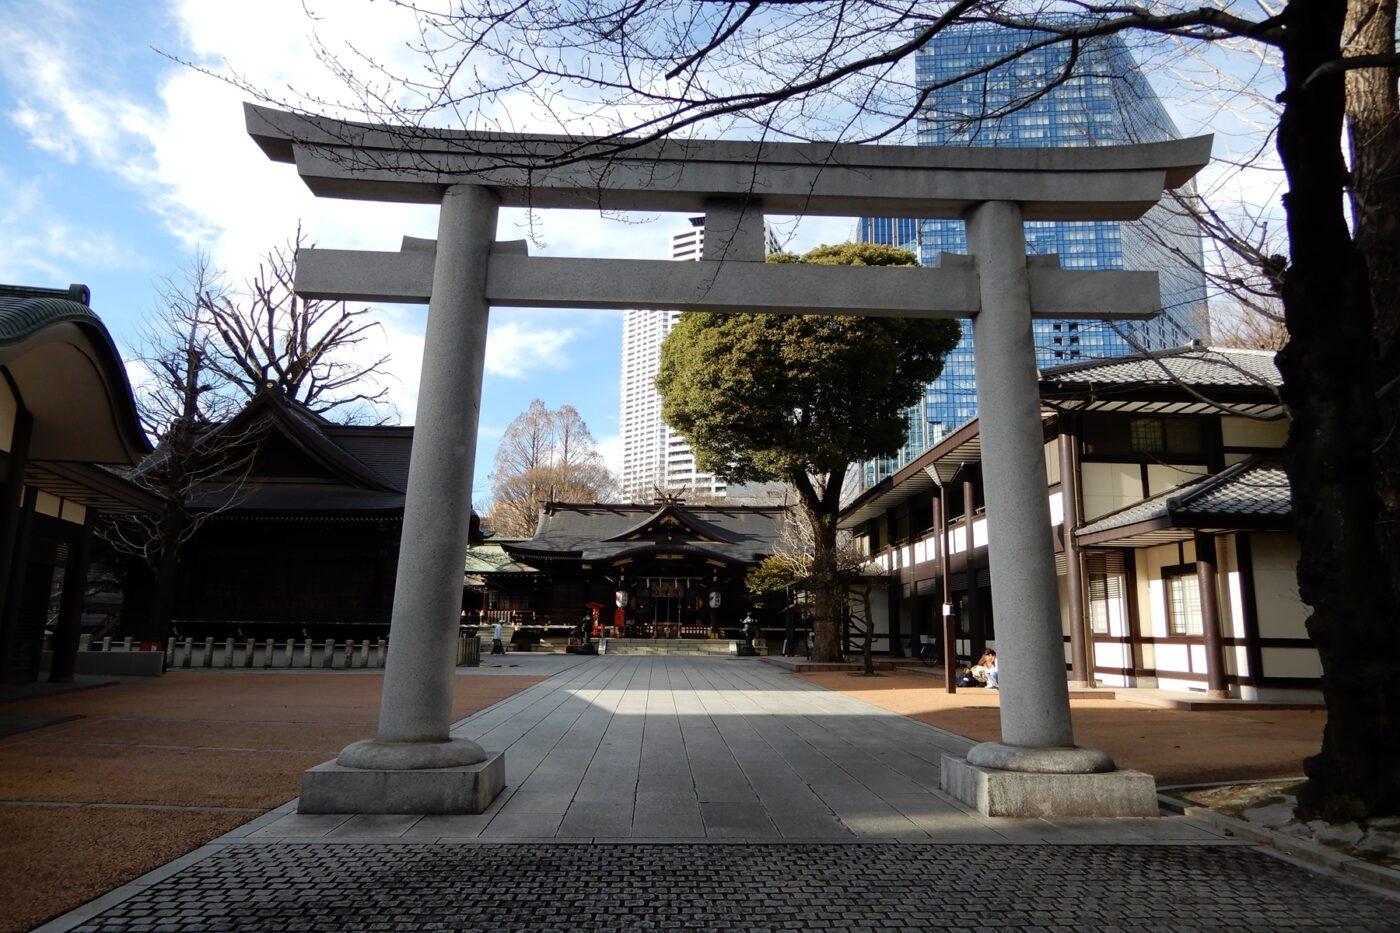 十二社熊野神社の写真